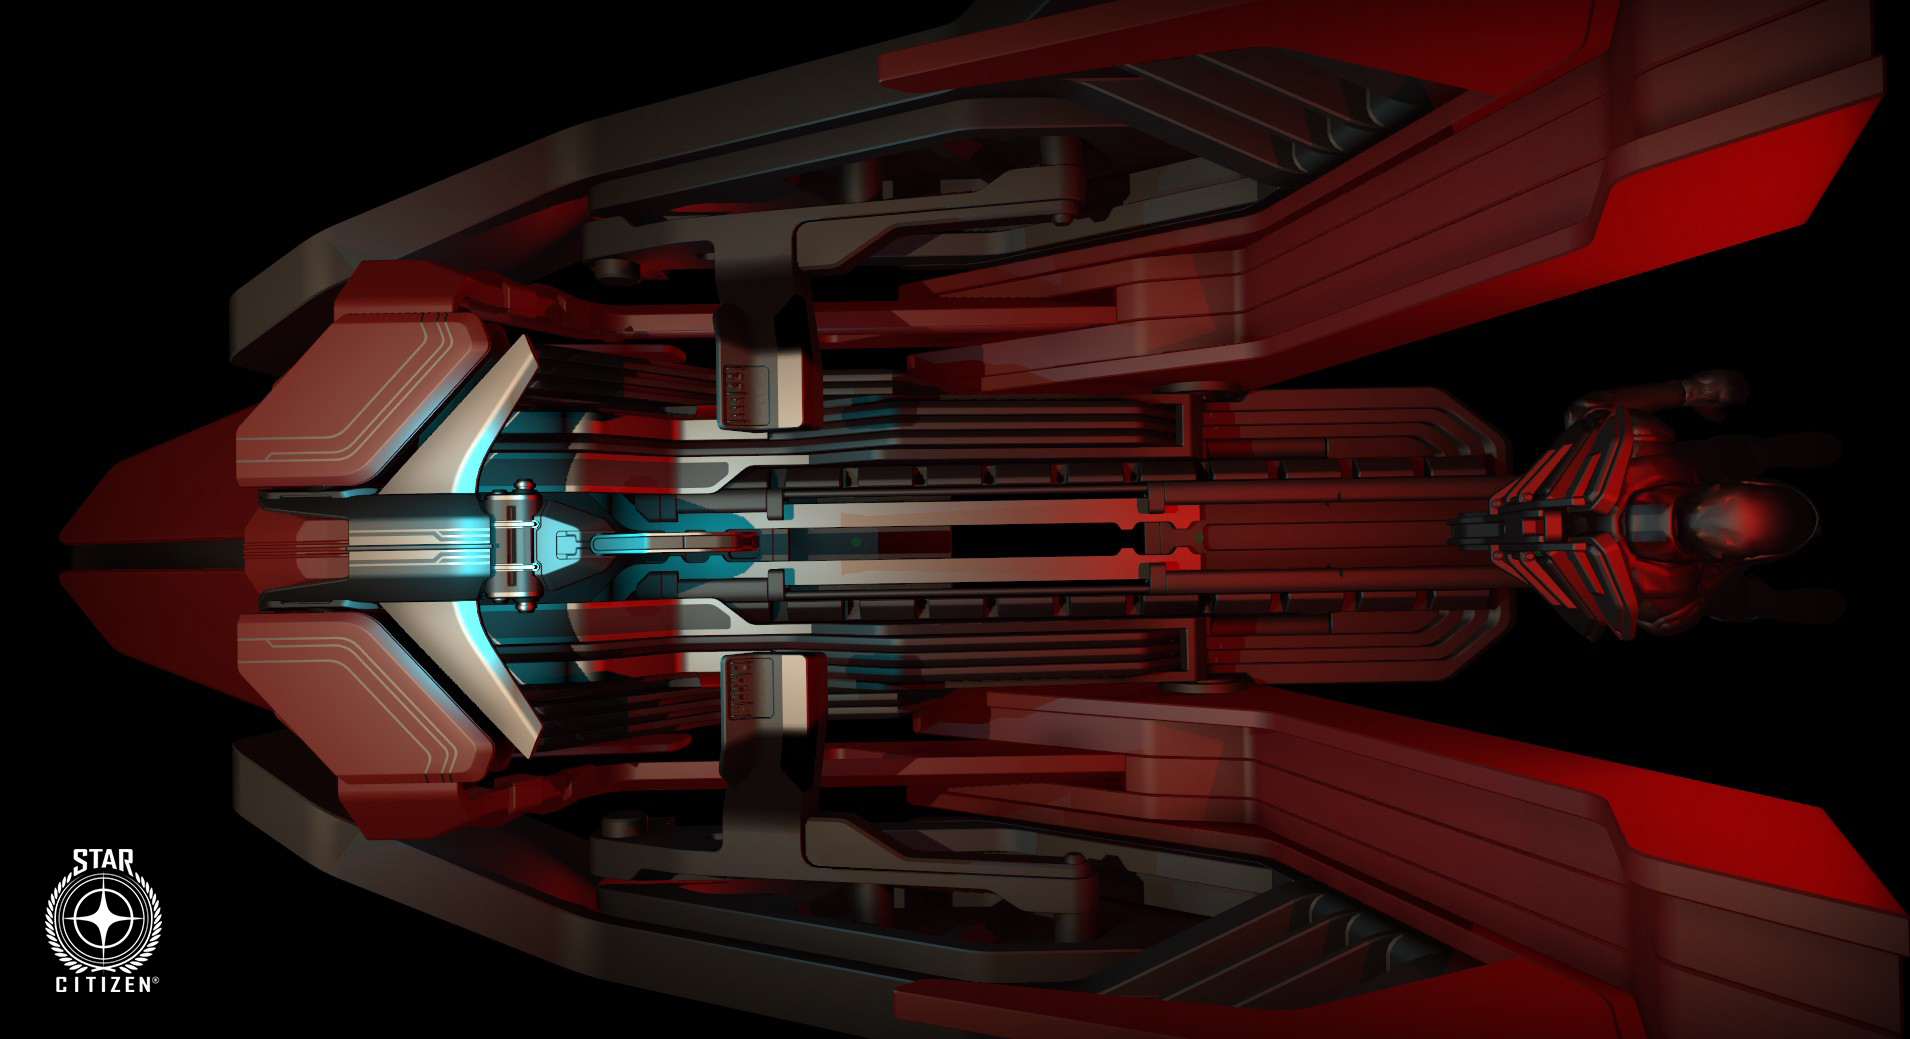 CloudImperiumGames StarCitizen WhiteBoxShip 2595